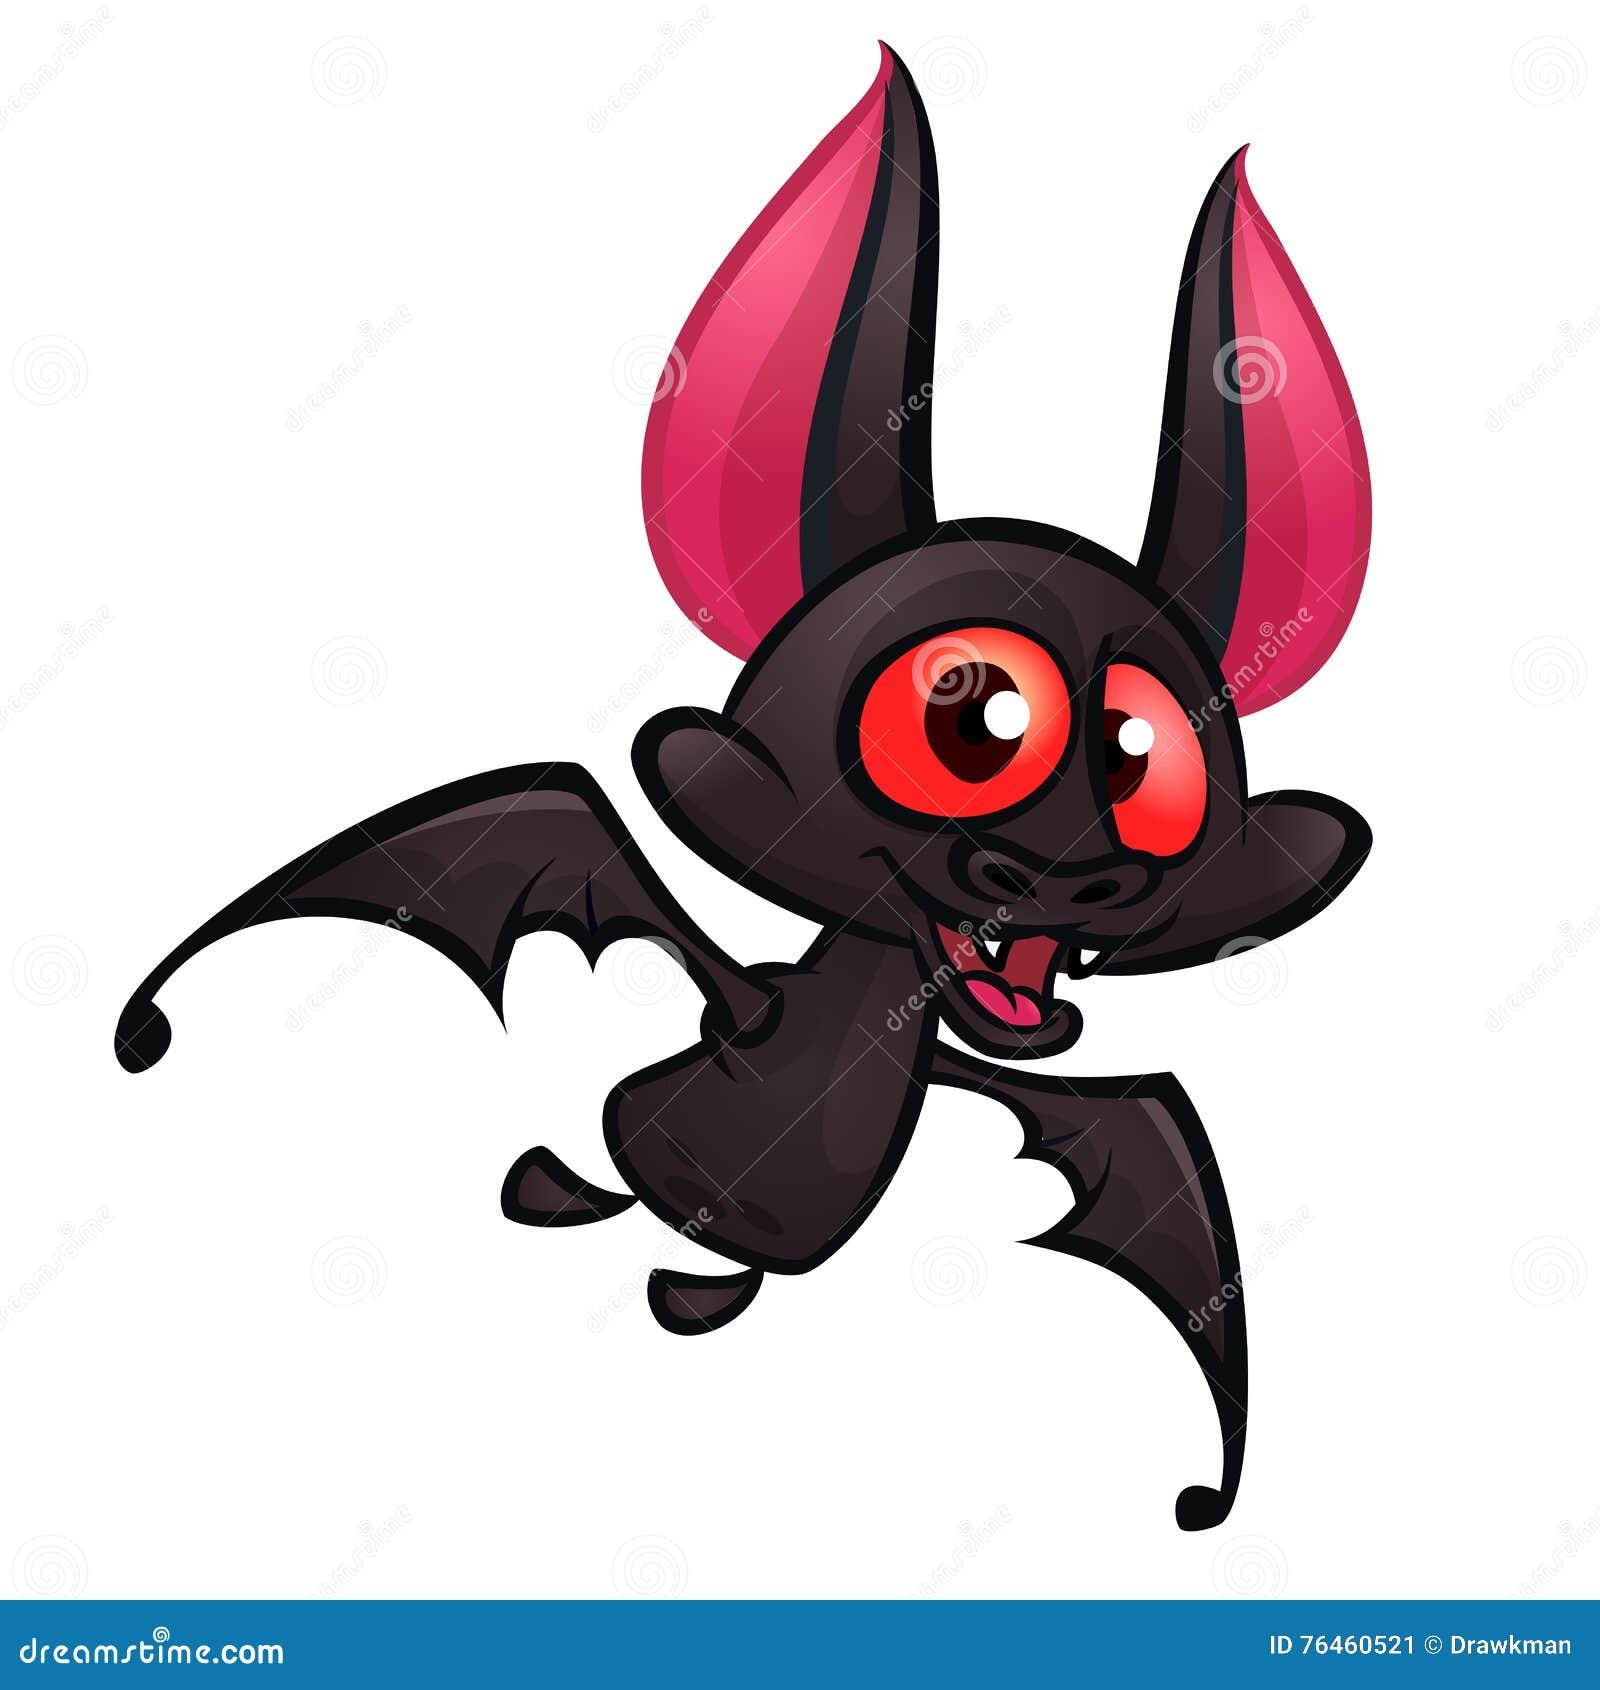 Cartoon Bats: Illustration Of Cute Cartoon Halloween Bat Flying Stock